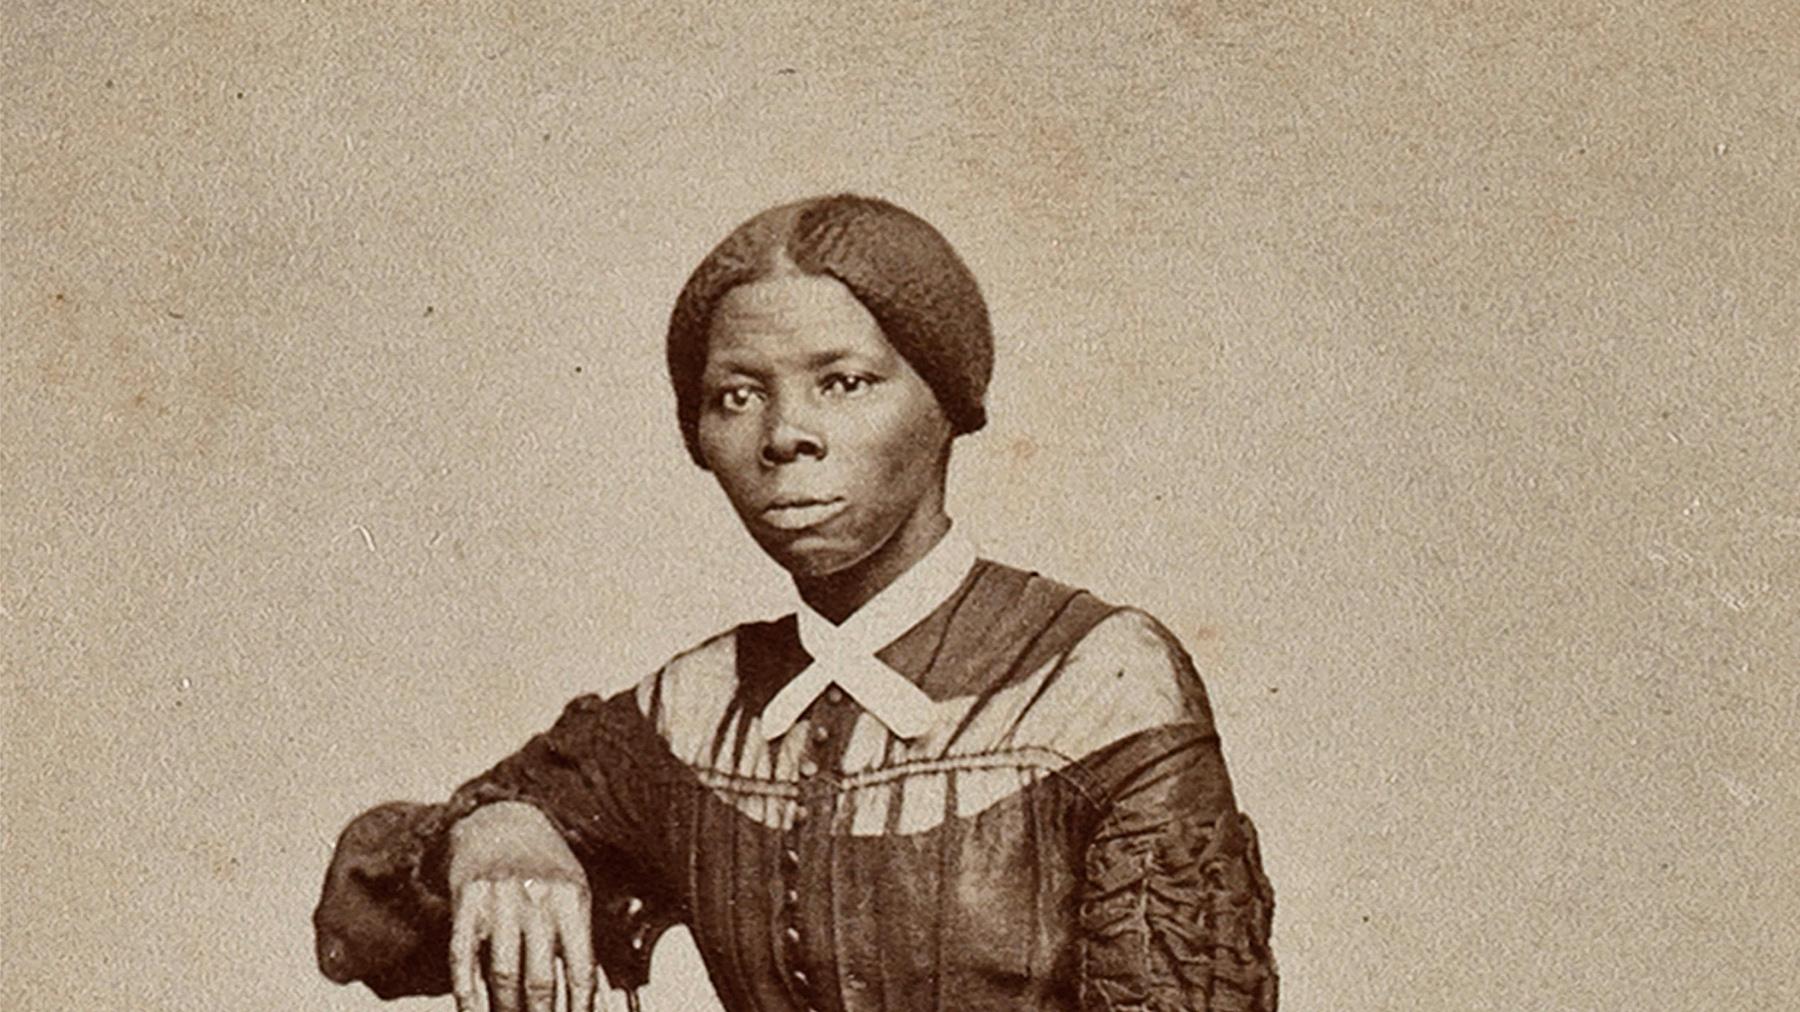 Delay of Harriet Tubman $20 bill undergirded by racism ...